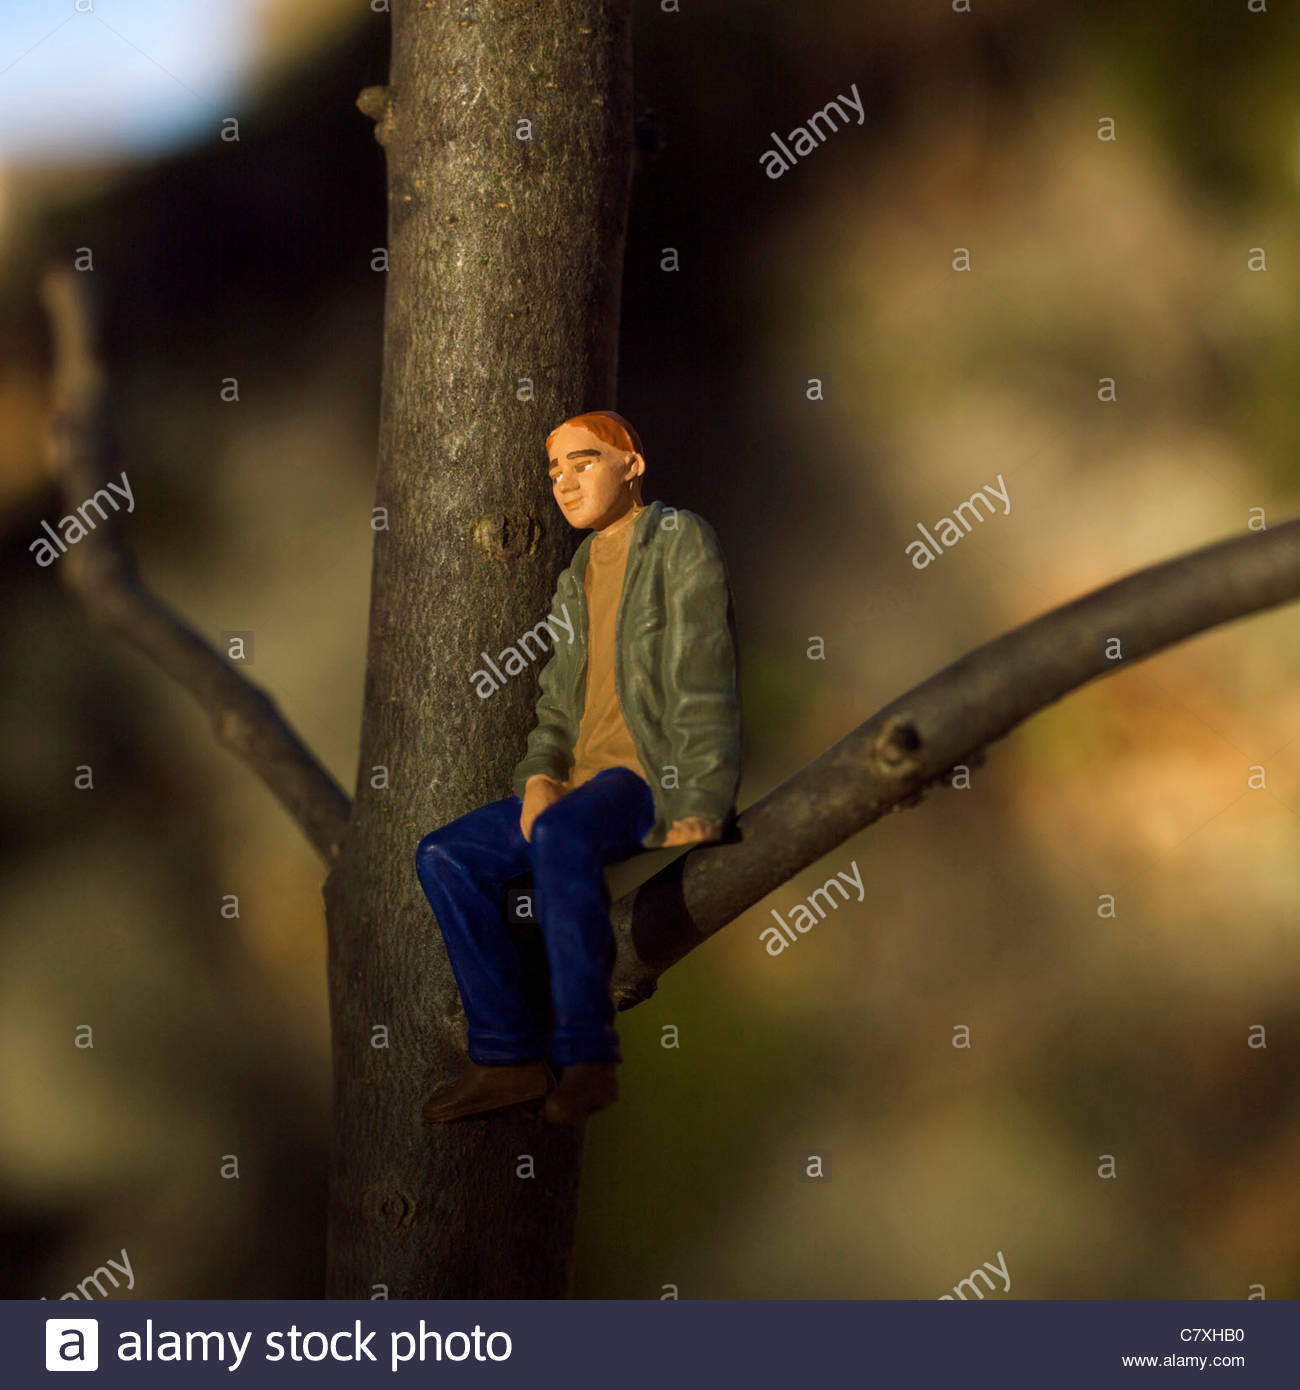 Solitary male figure alone - Stock Image